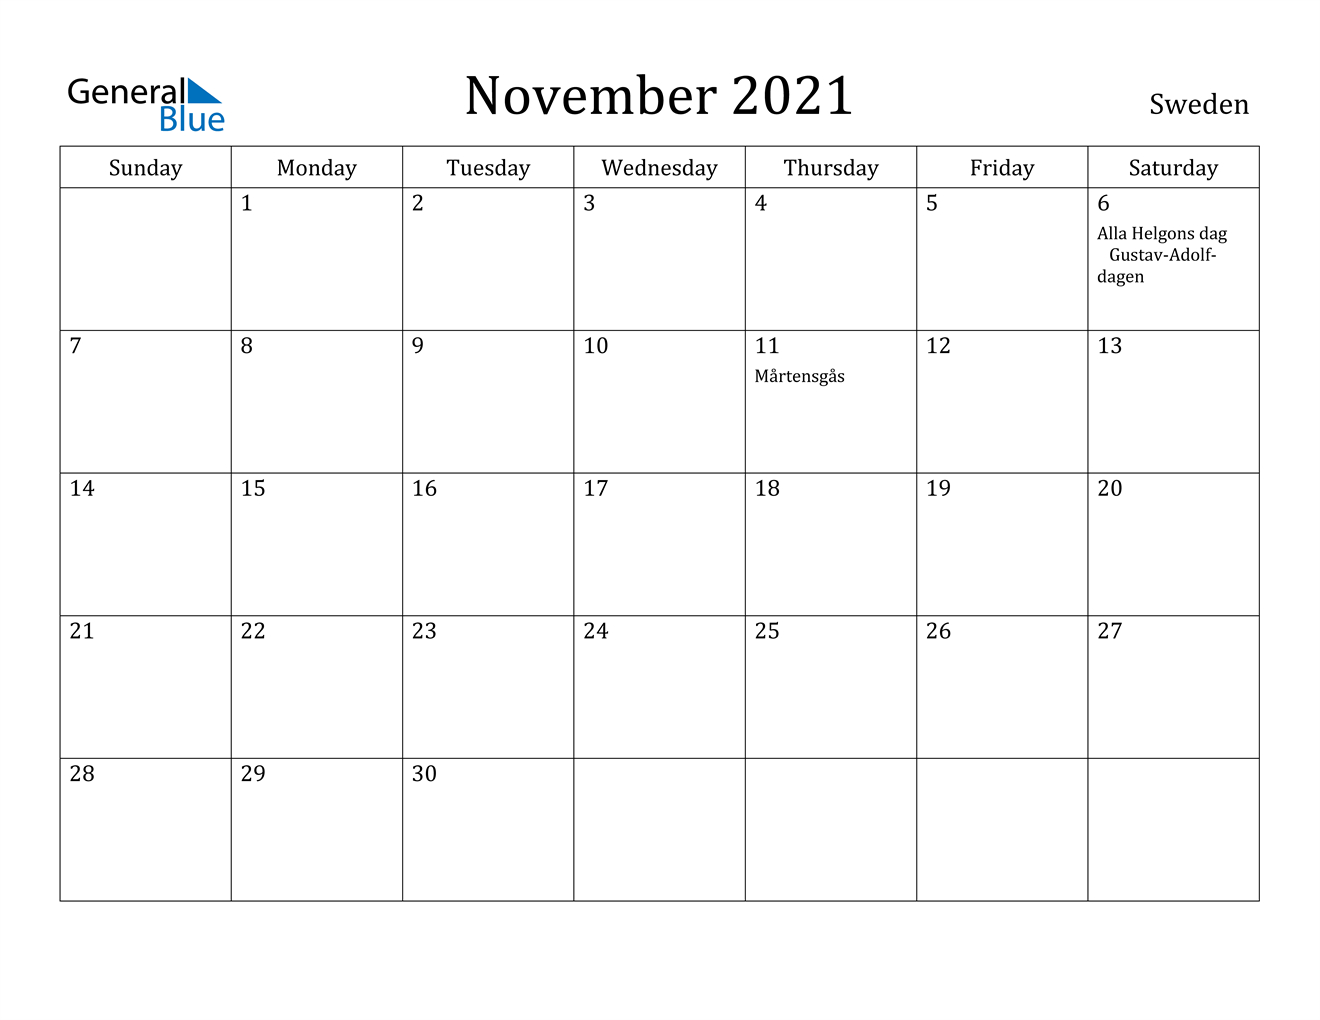 November 2021 Calendar - Sweden